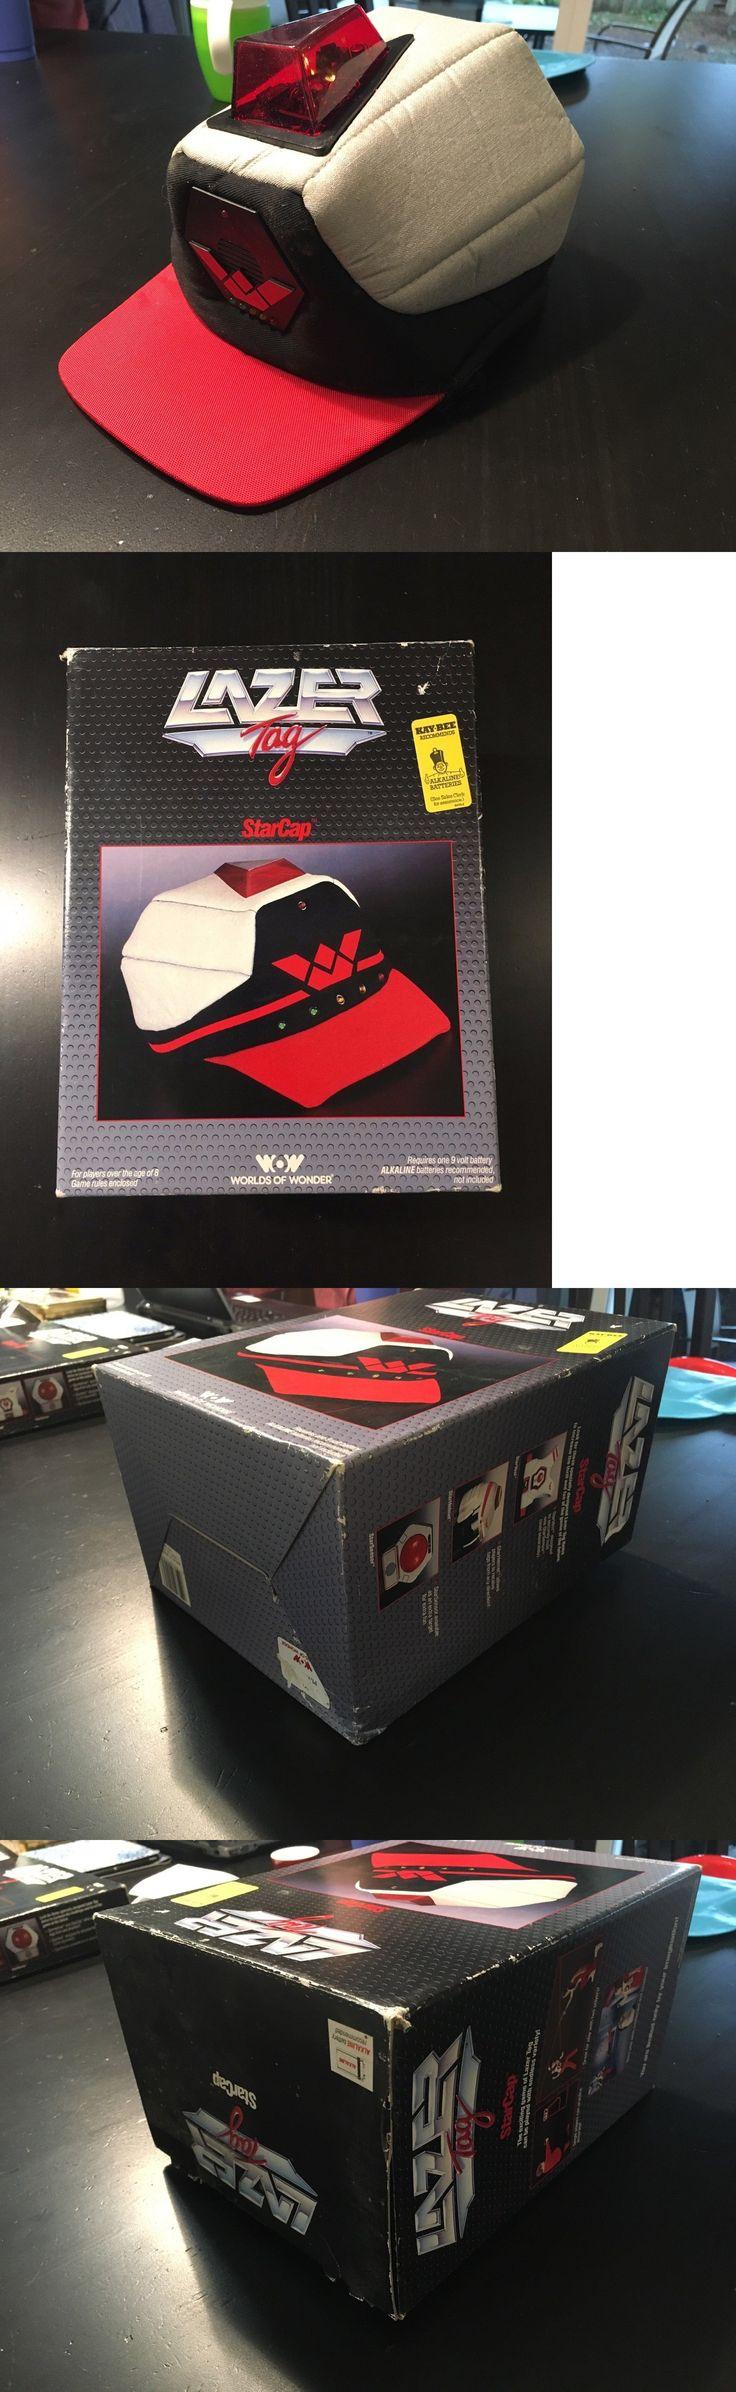 Laser tag 168245 vintage 1986 wow lazer tag starcap w box